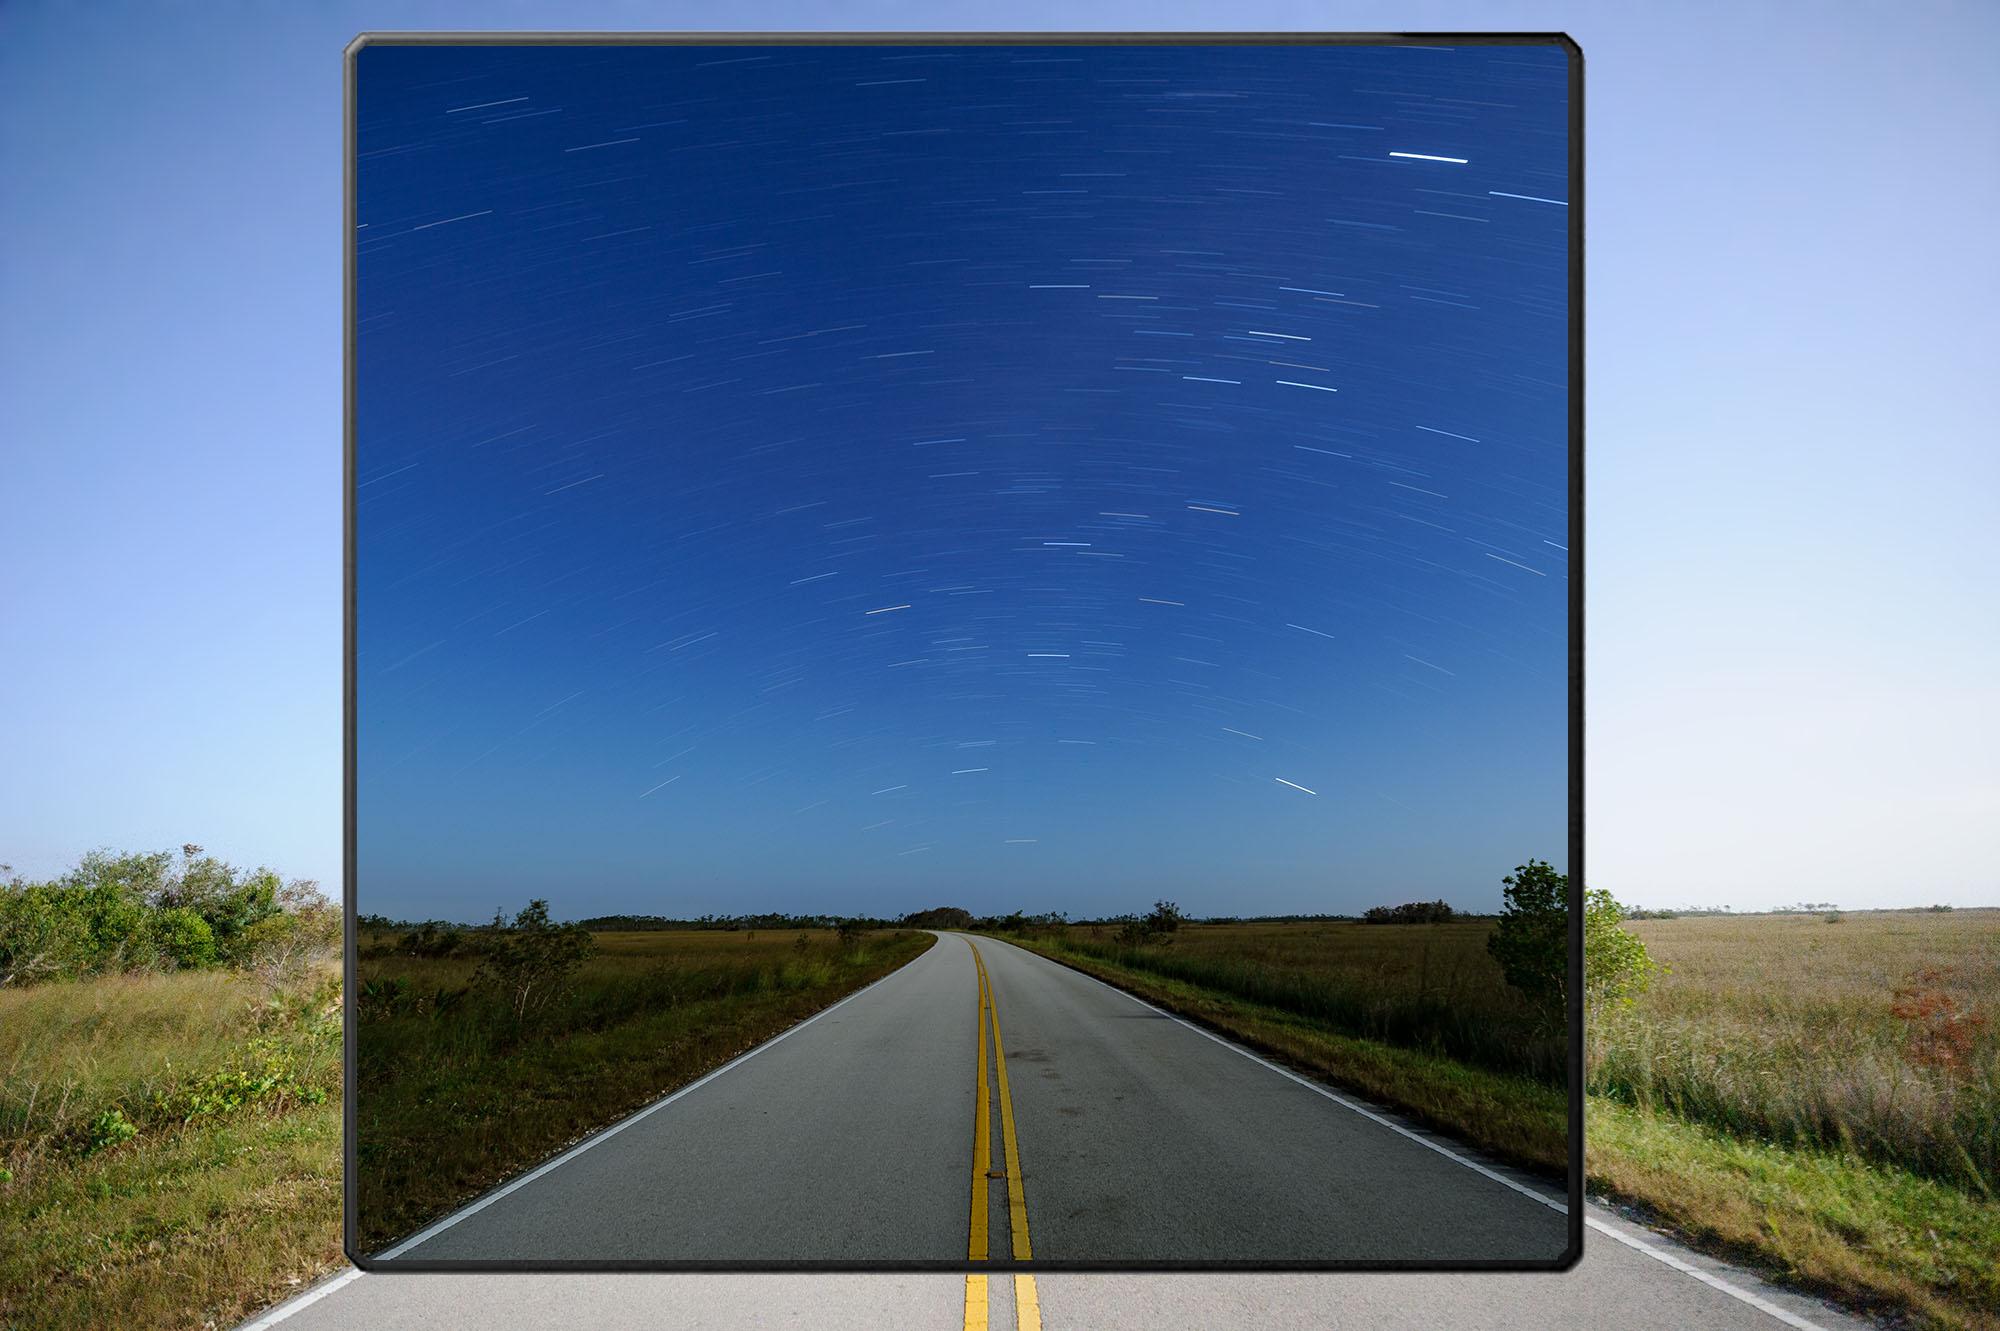 star trails_DSC8222_Chris Nicholson_product.jpg